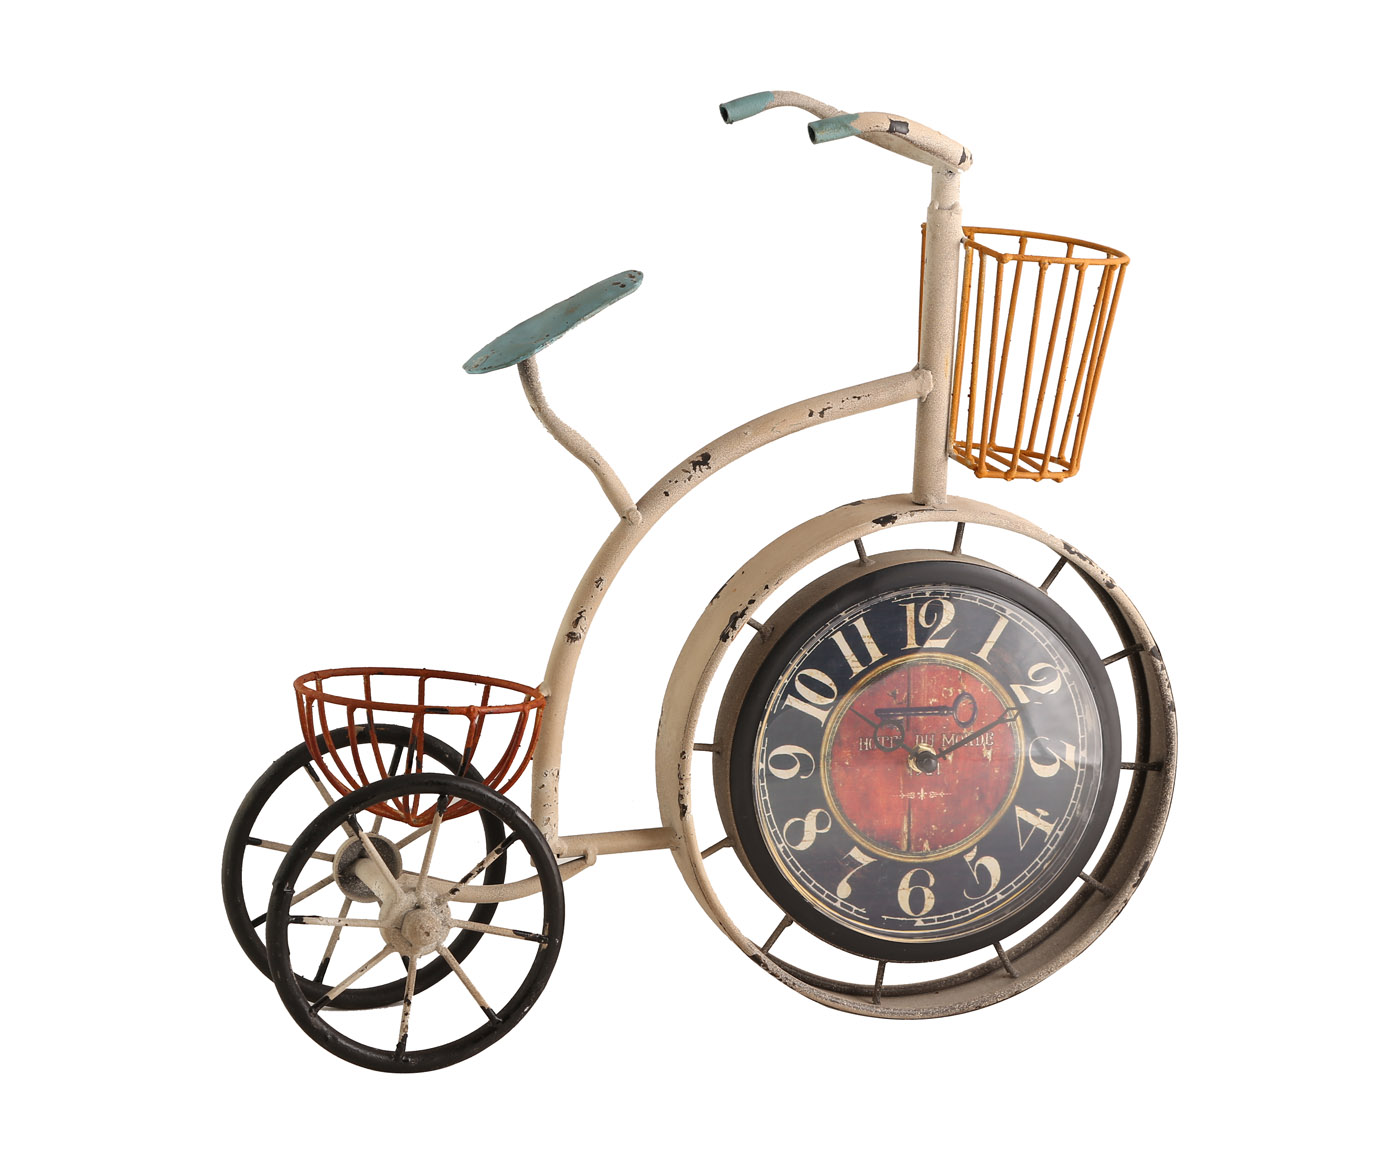 Часы настольныеНастольные часы<br>Кварцевый механизм, работают от батарейки типа АА.<br><br>Material: Металл<br>Width см: 46<br>Depth см: 14<br>Height см: 45